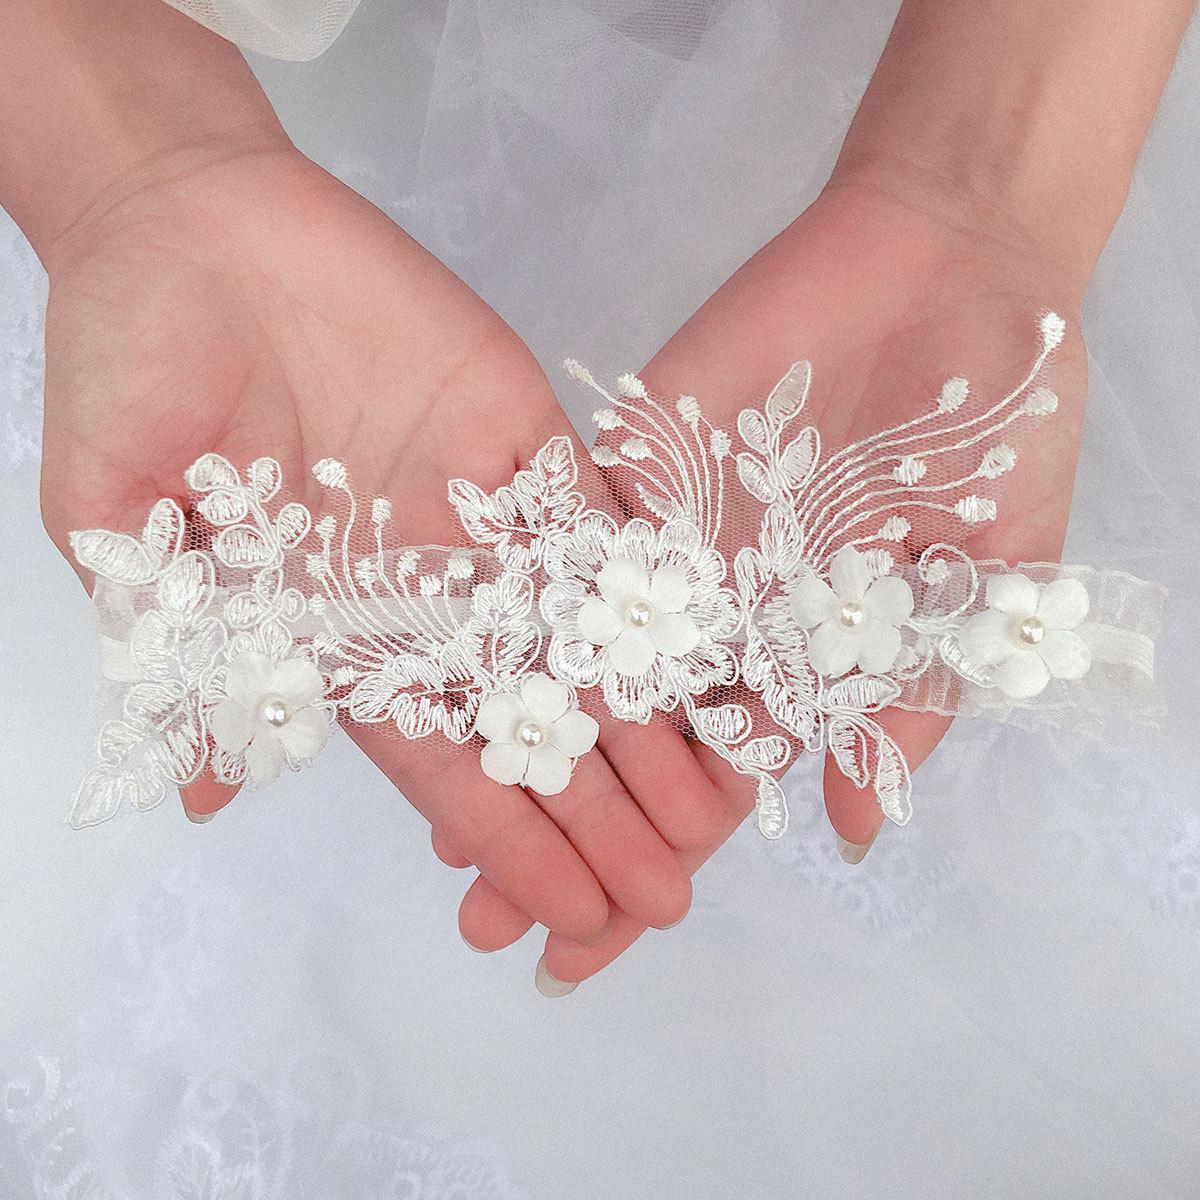 Kyunovia Lingerie Wedding Gift Party Bridal Accessories Sexy Lace Leg Garter Belt Women Elastic Leather Leg Ring Garter BY36